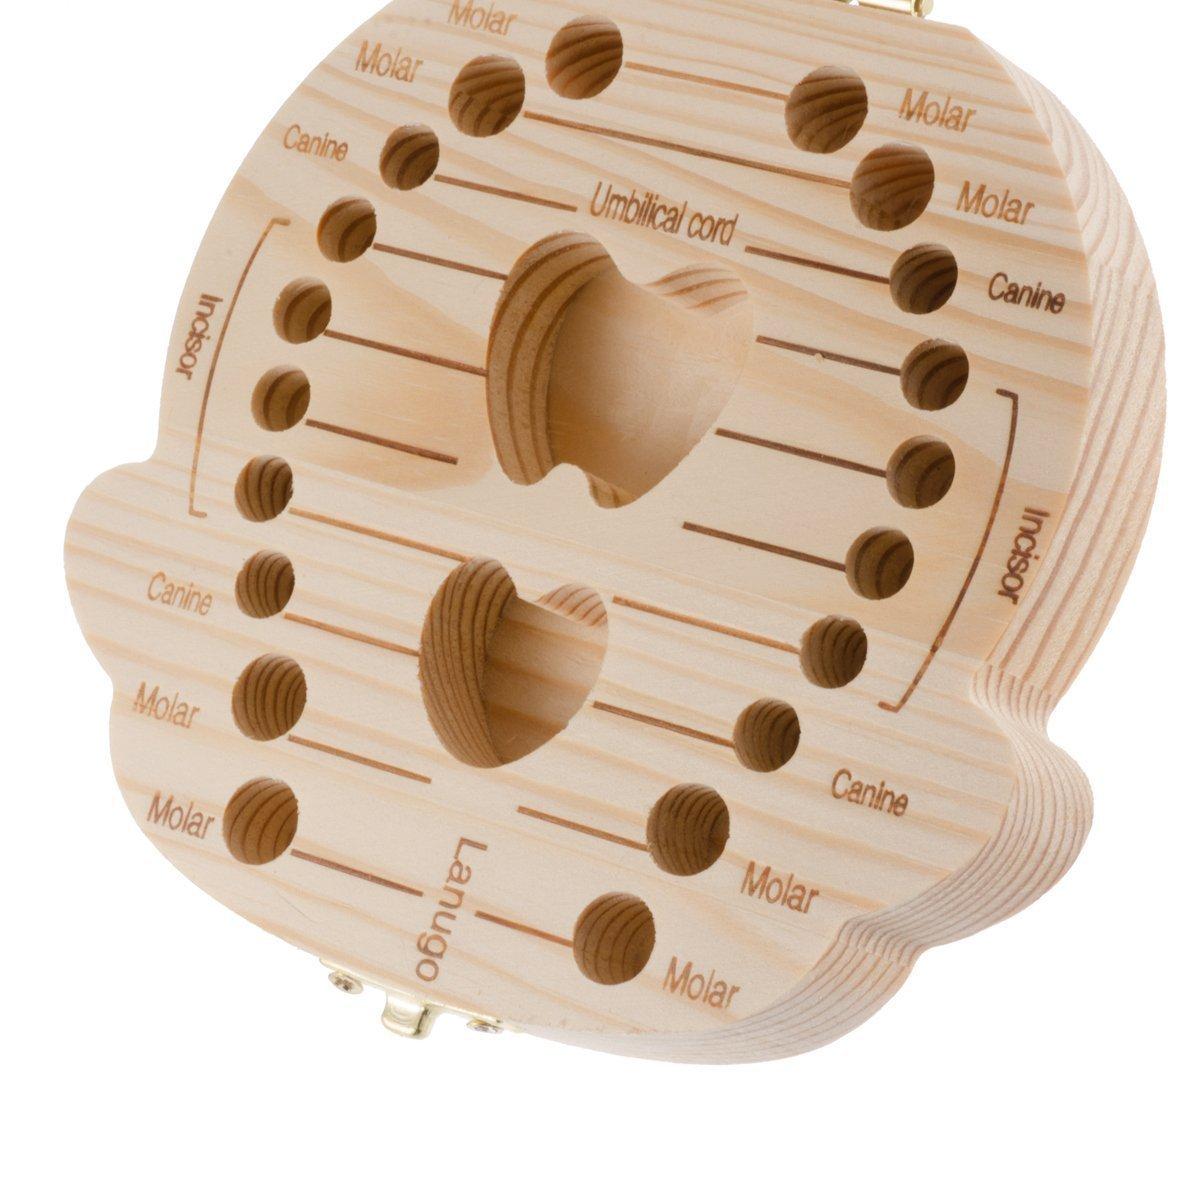 CAOLATOR Caja de Madera de Almacenamiento para Dientes De Leche Ni/ña Lengua Espa/ñola